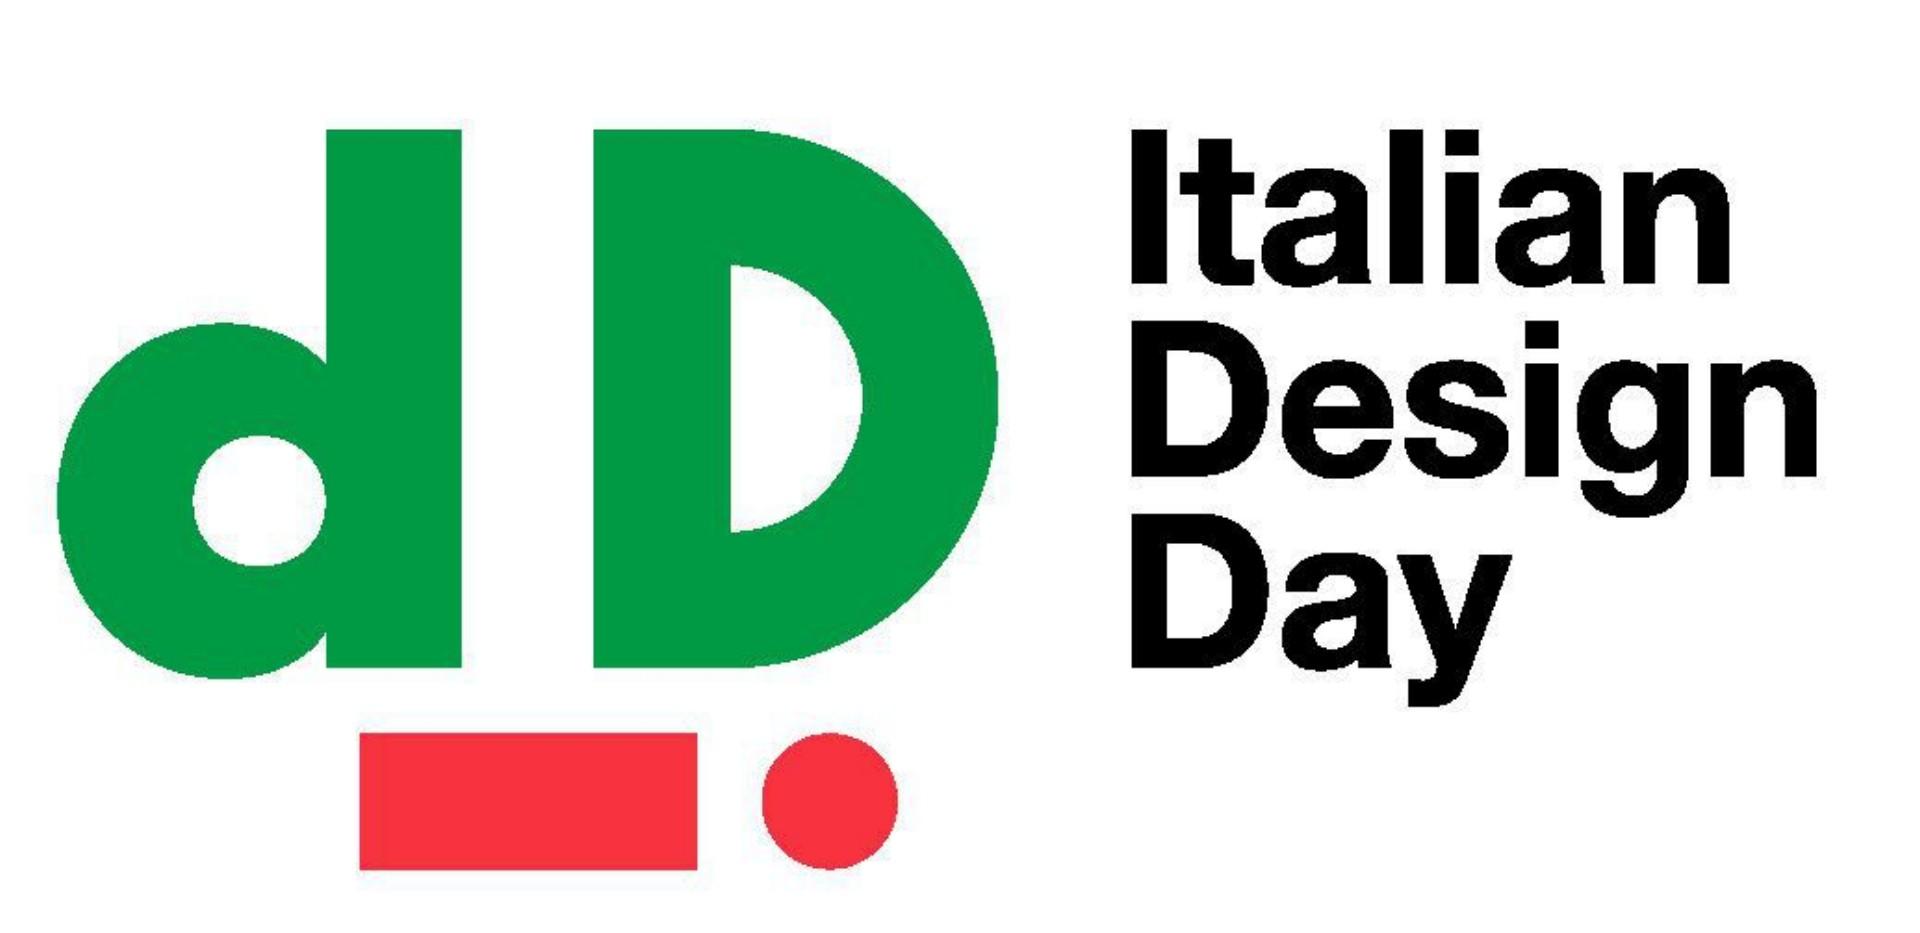 Italian Design Day 2018 - Piuarch est l'un des 100 ambassadeurs